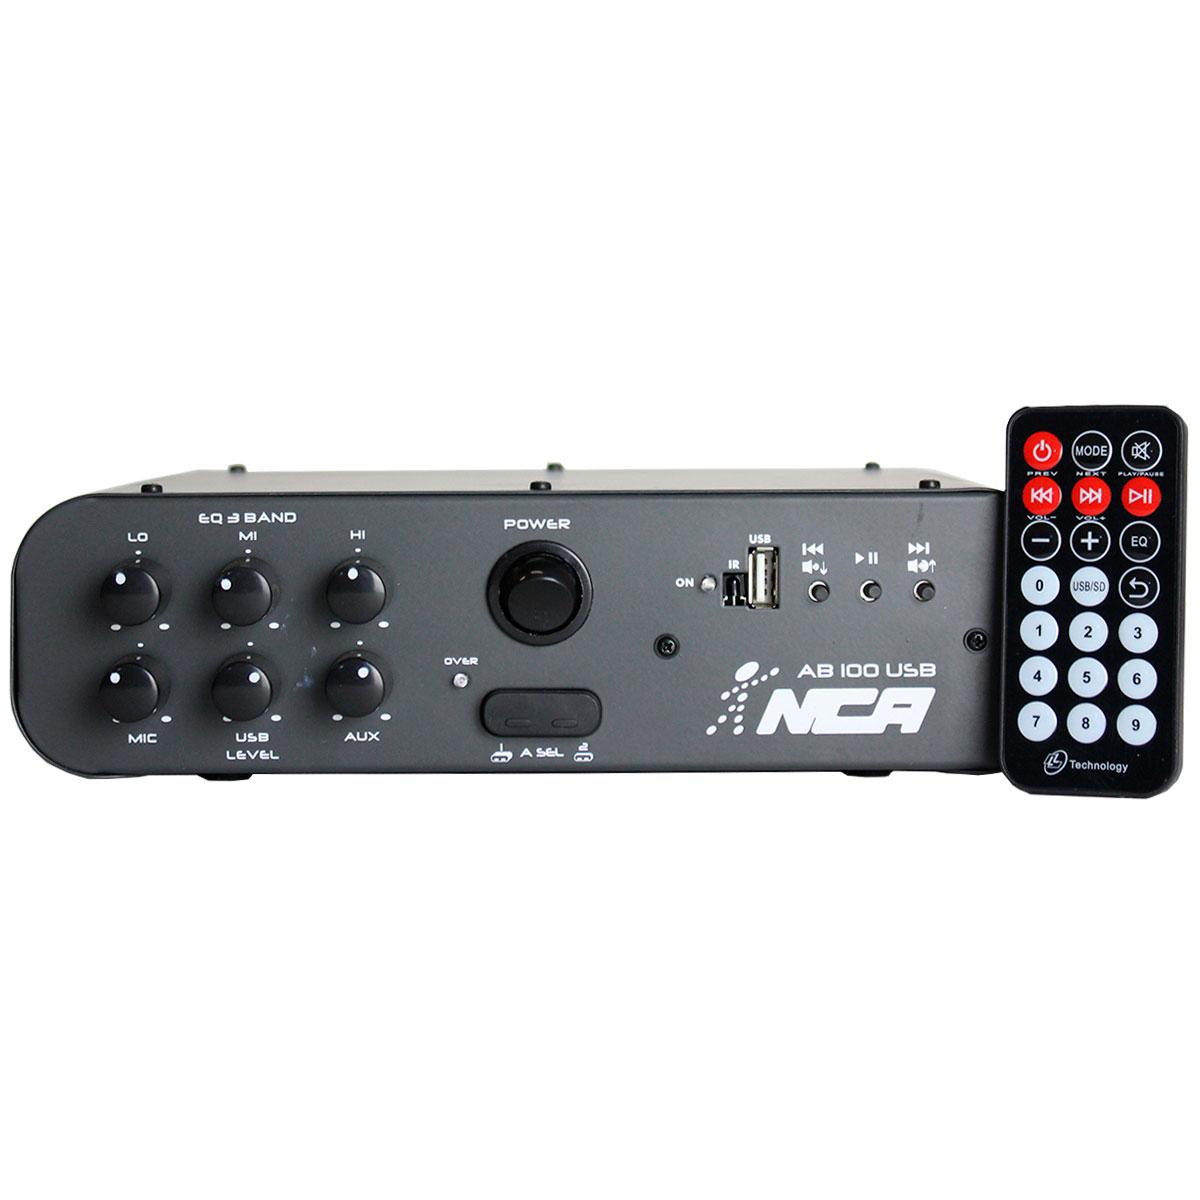 Amplificador Ab100 Usb 100w Rms Nca